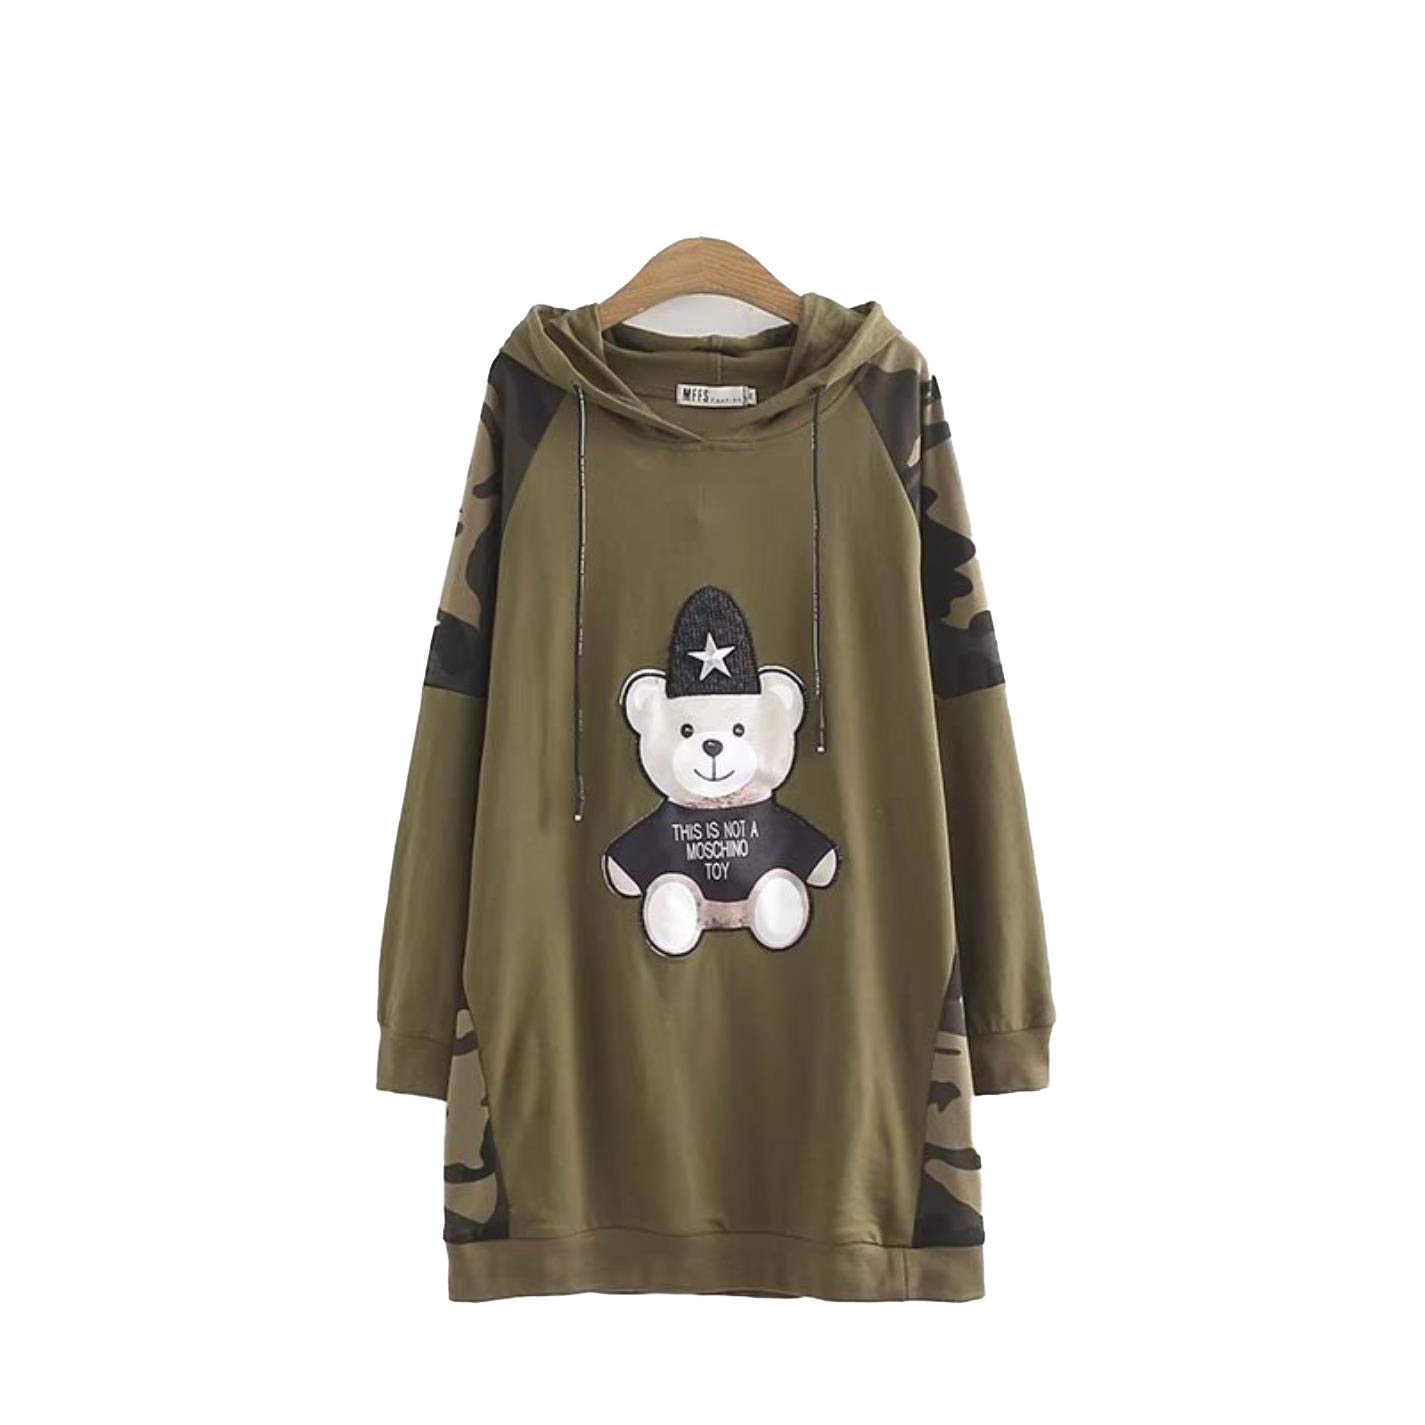 BTSSA Women's Embroidered Cotton Loose Sports Camouflage